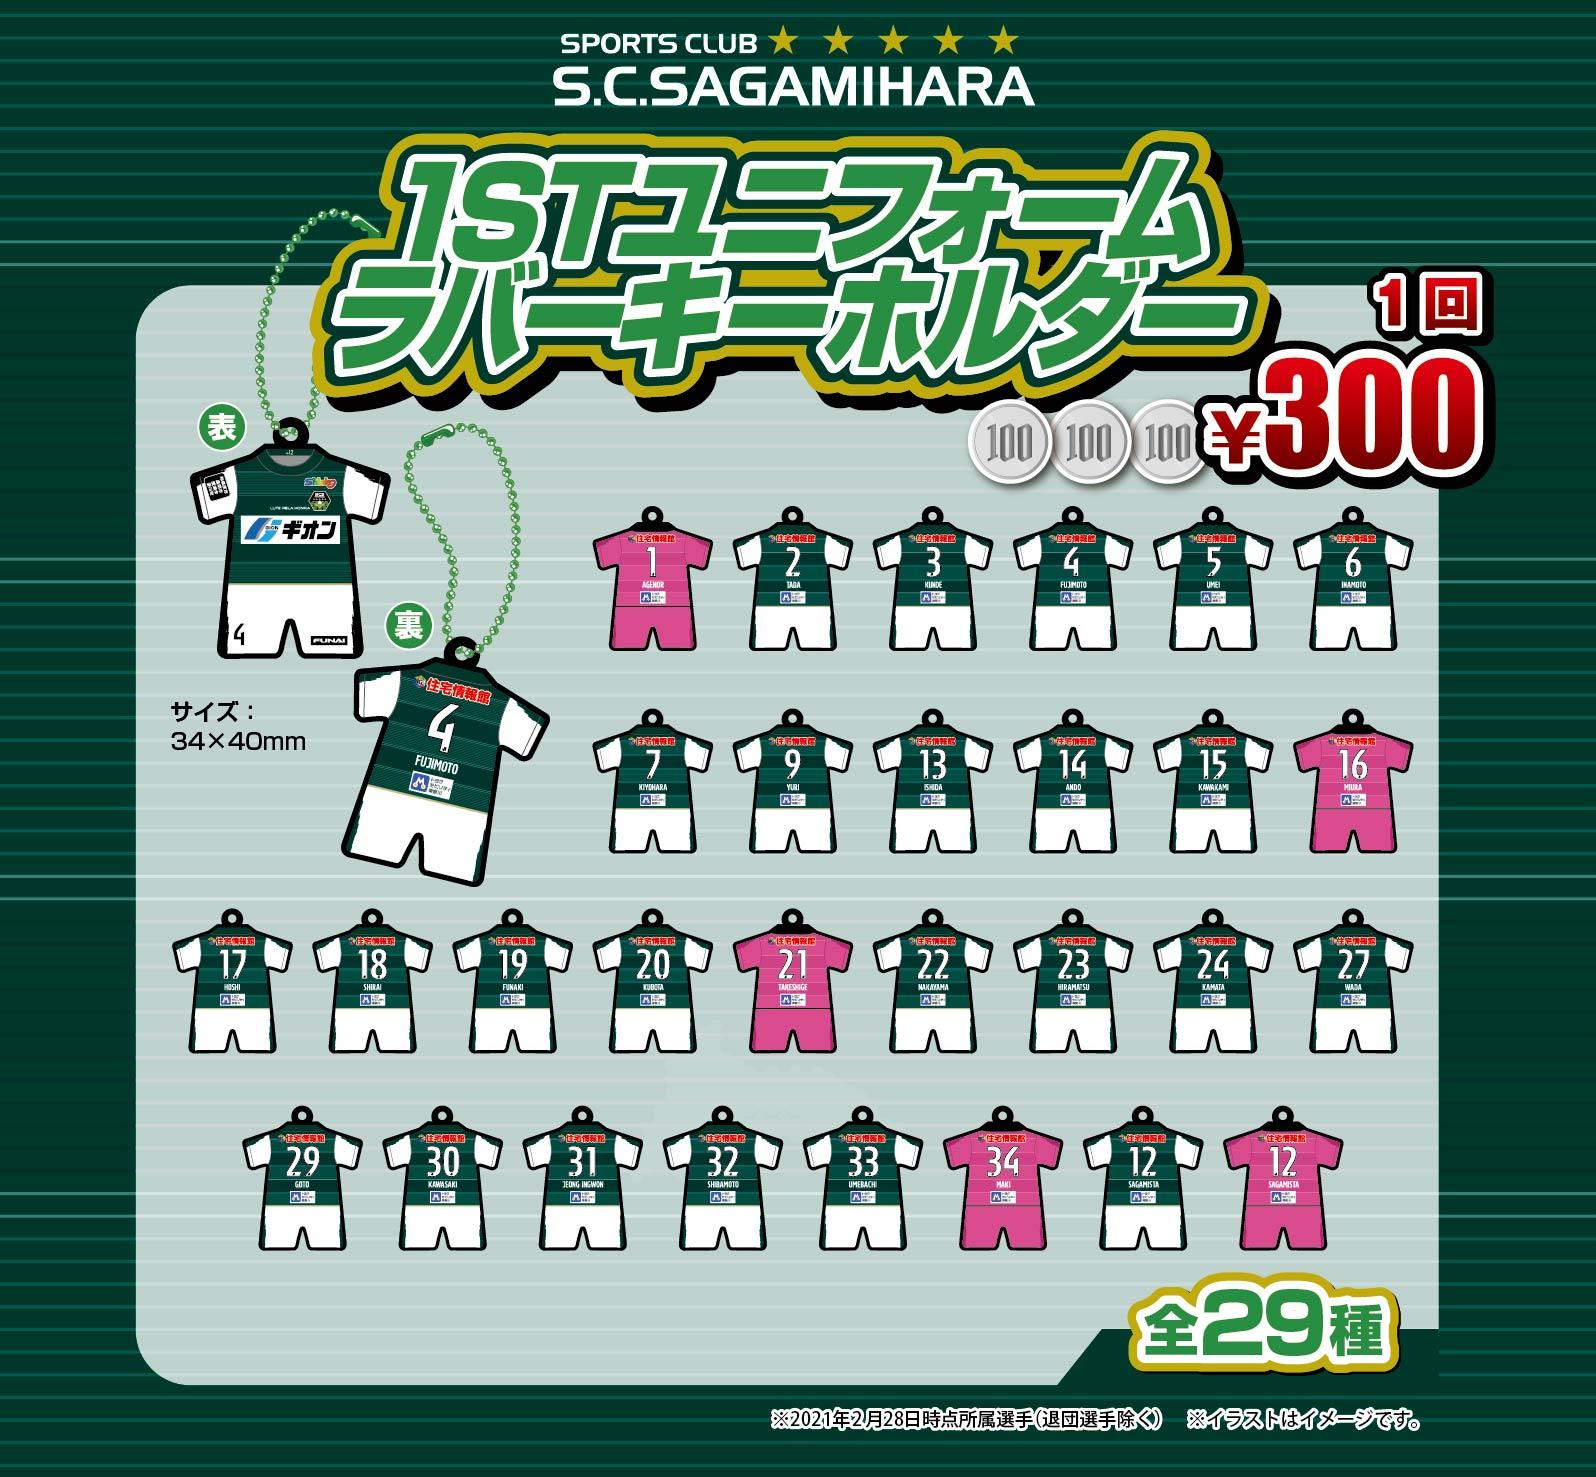 sagamihara_unirubberkey_1st_daishi_0614-01.jpg